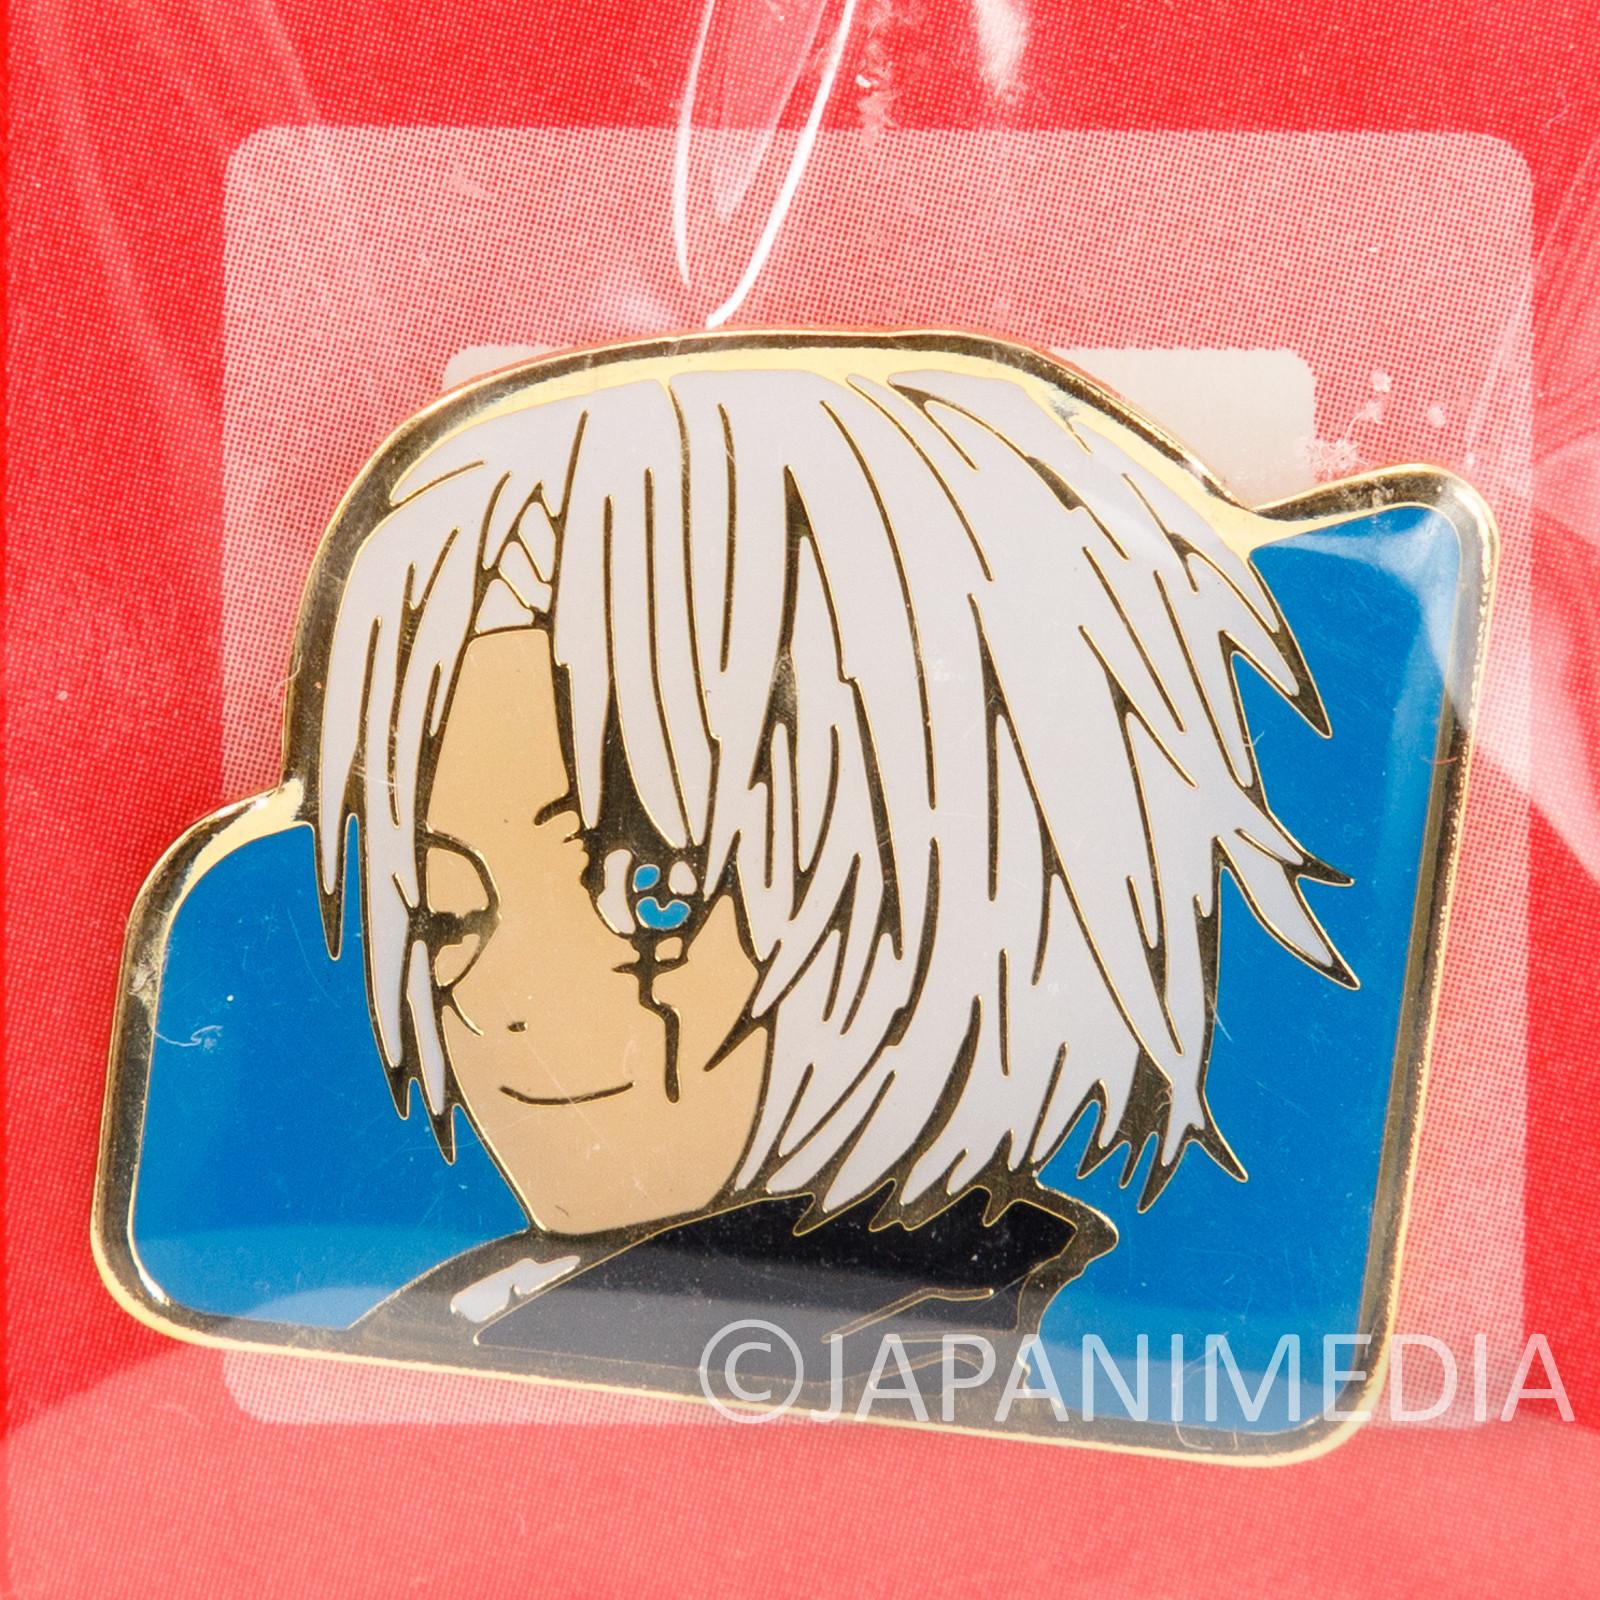 D.Gray-man Allen Walker Weekly Jump Character Pins JAPAN ANIME MANGA